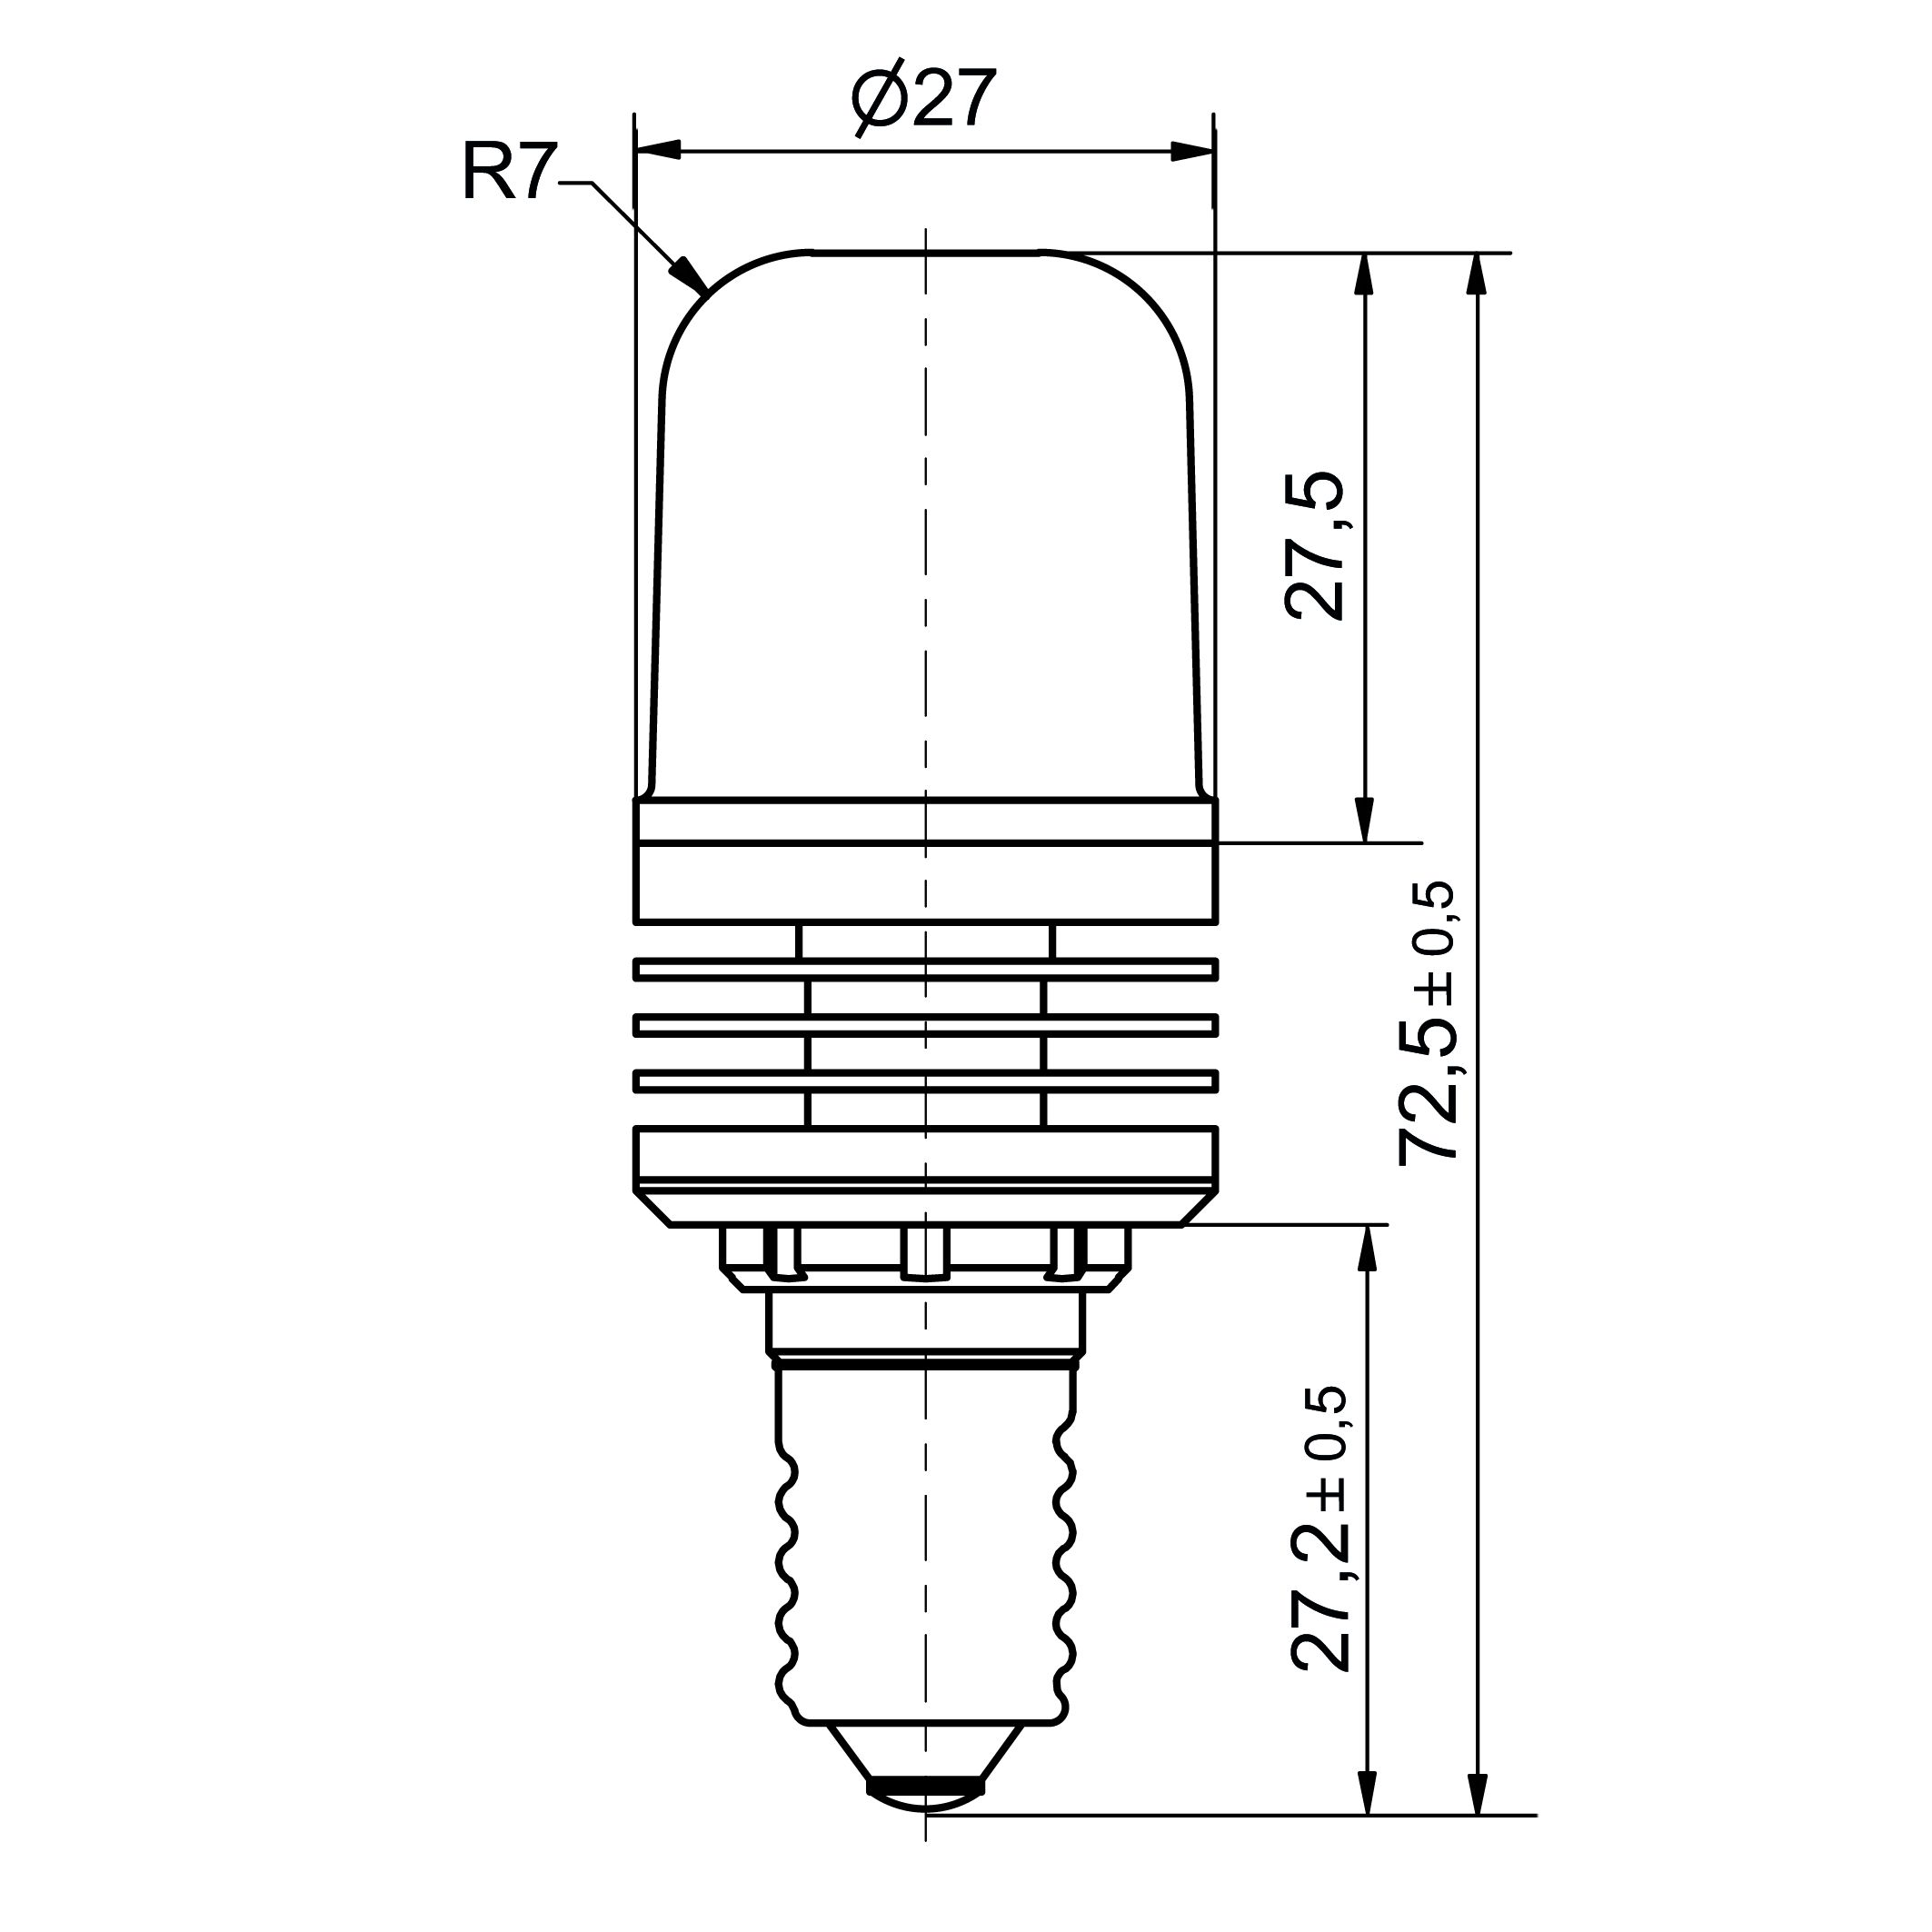 Notlicht LED-Lampe Sistar® 3P Sockel E14 - plan